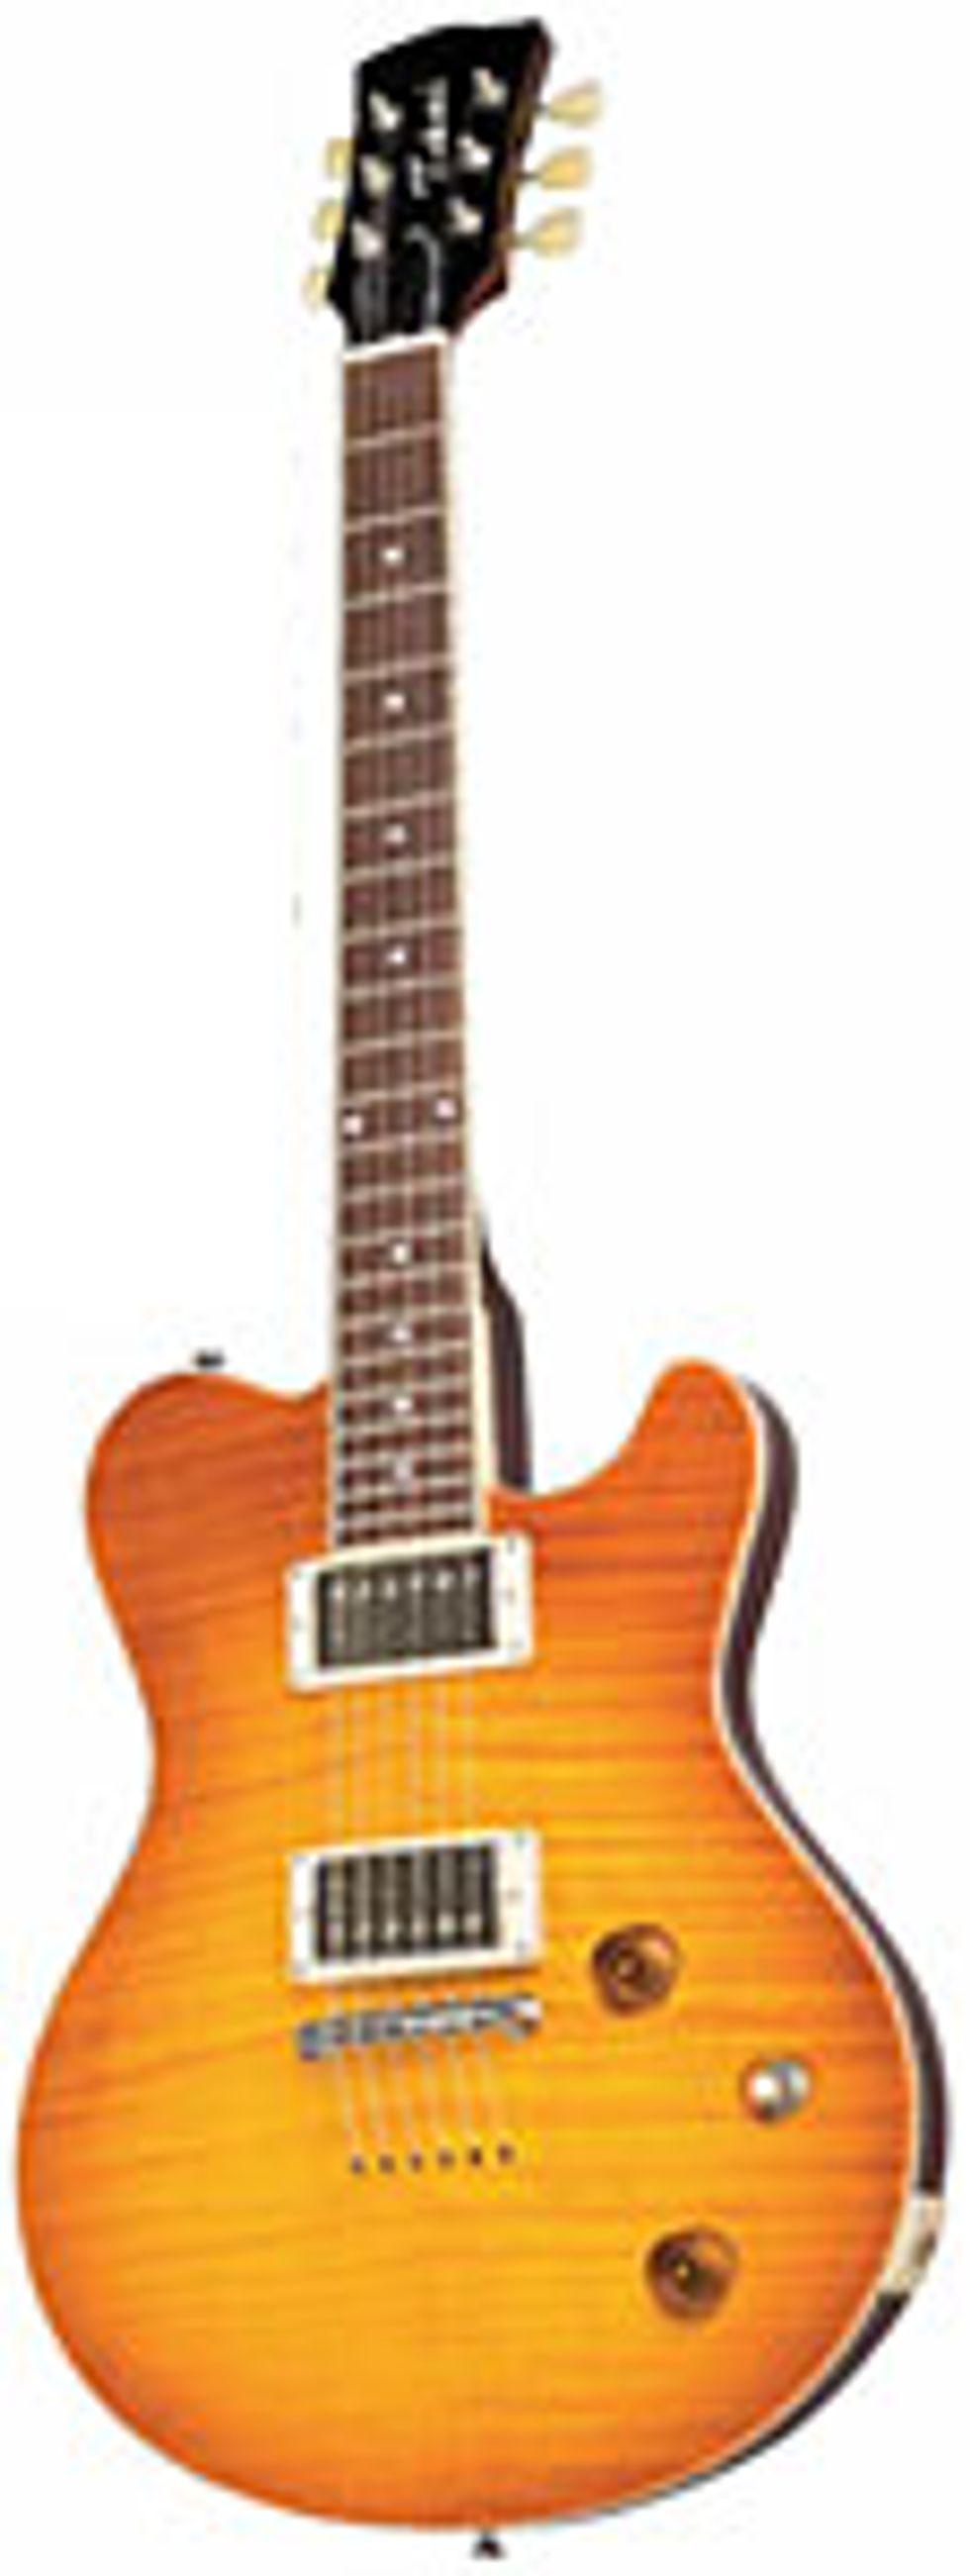 Tokai SC-2C Carved Top Guitar